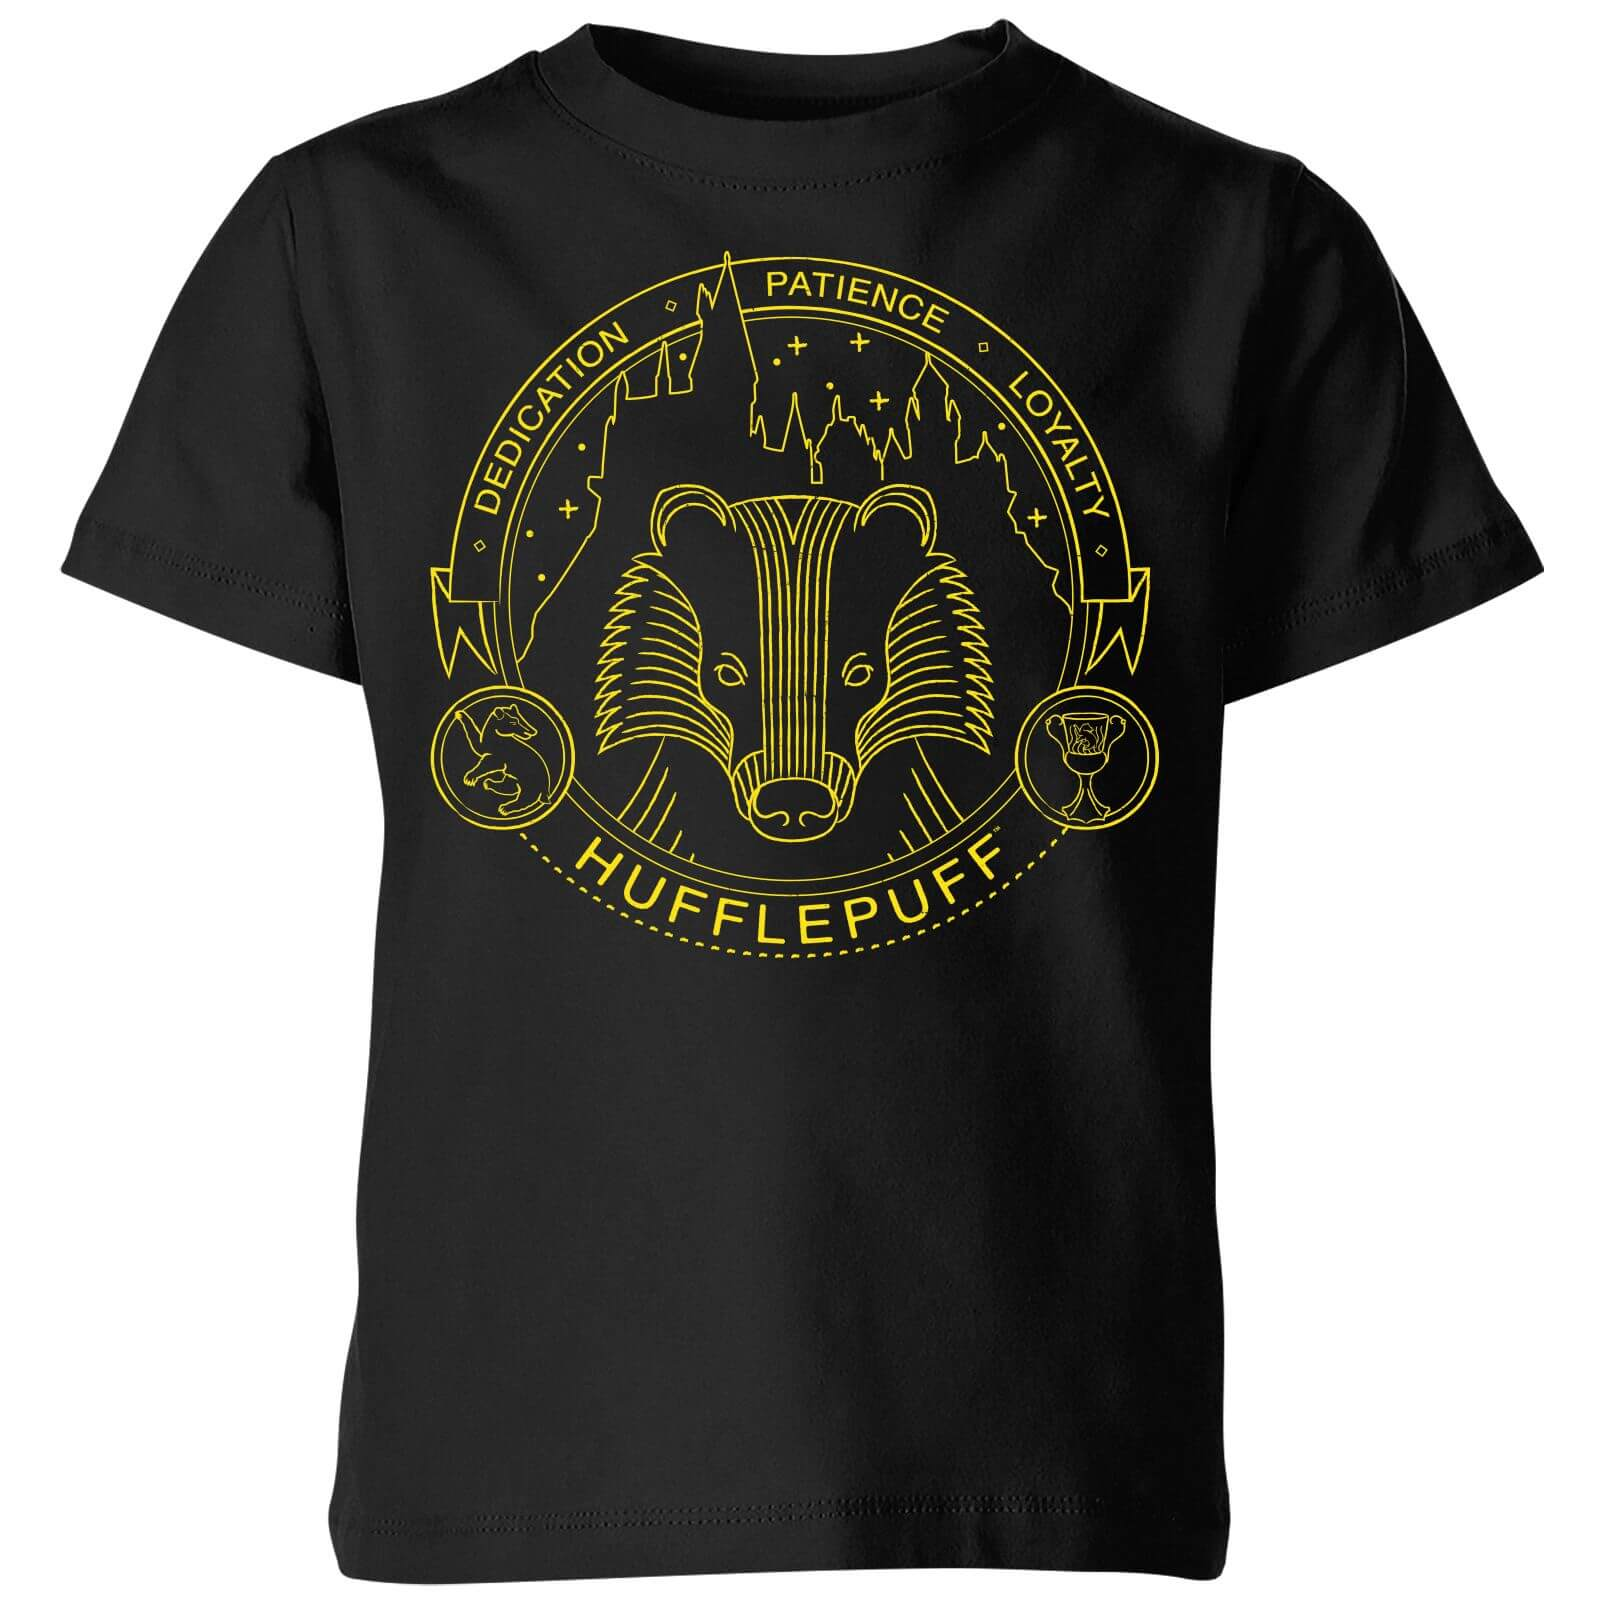 5d493b62c1fe7 Harry Potter Hufflepuff Badger Badge Kids' T-Shirt - Black